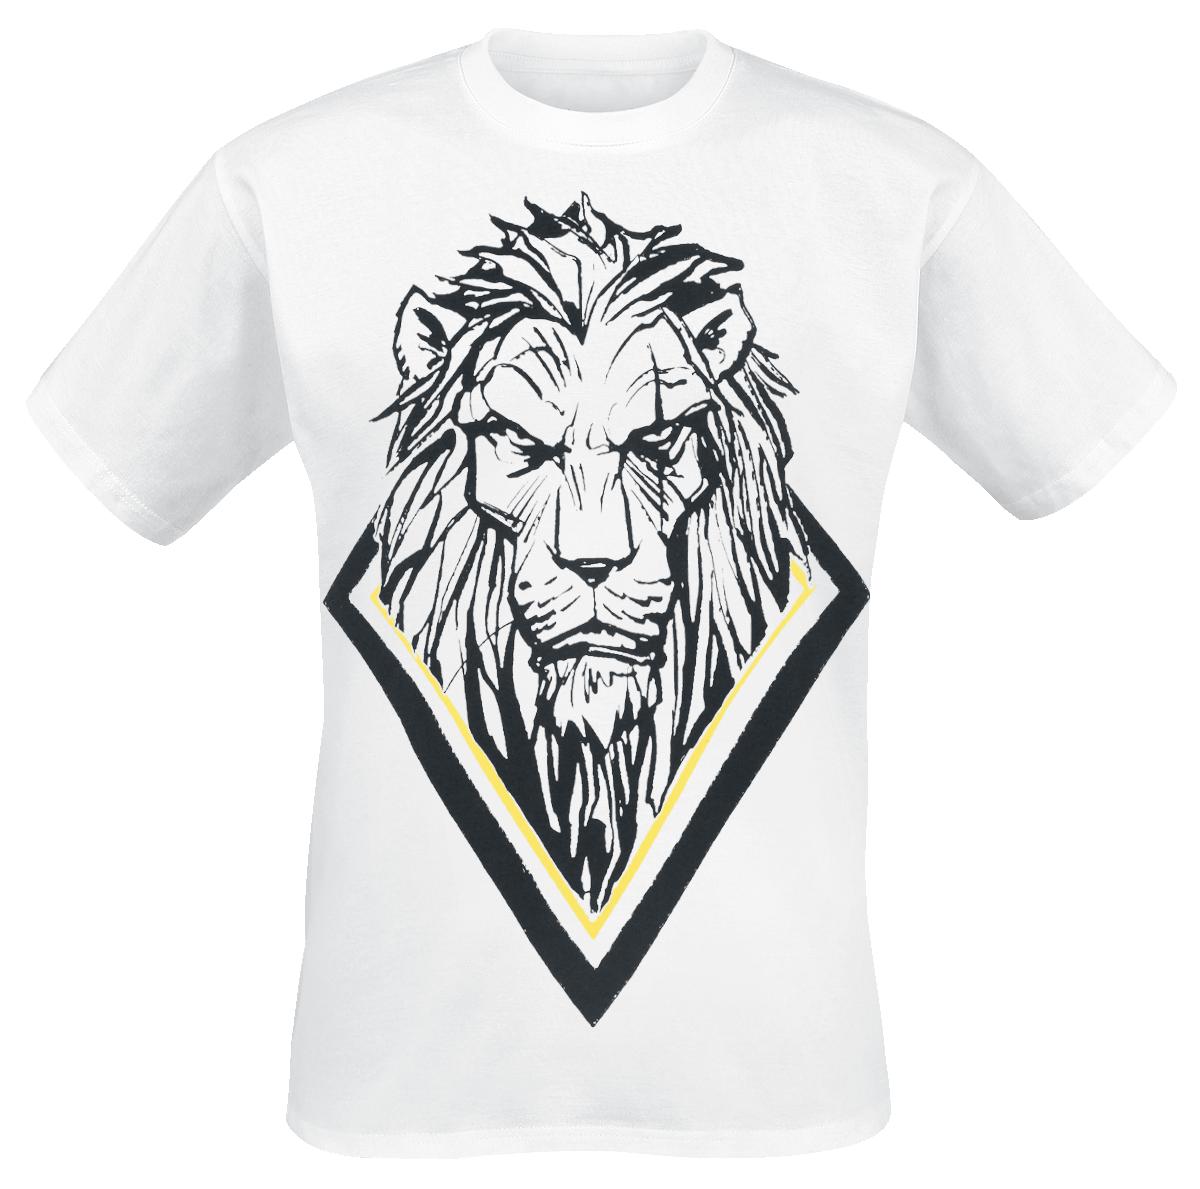 The Lion King - Scar - T-Shirt - white image